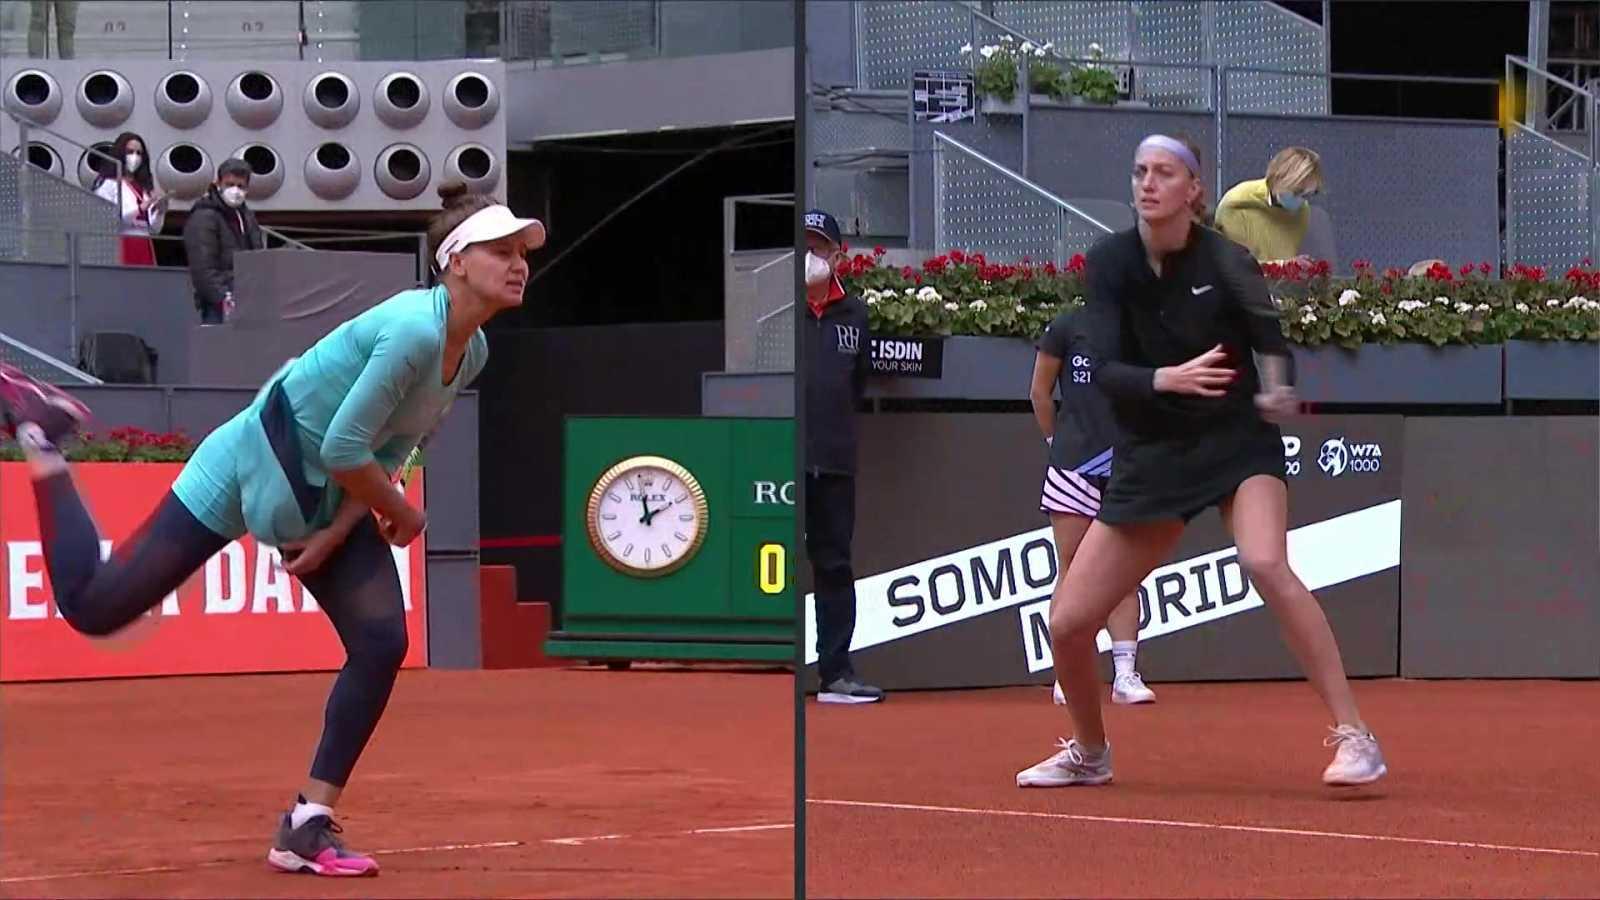 Tenis - WTA Mutua Madrid Open: Petra Kvitova - Veronika Kudermetova - ver ahora